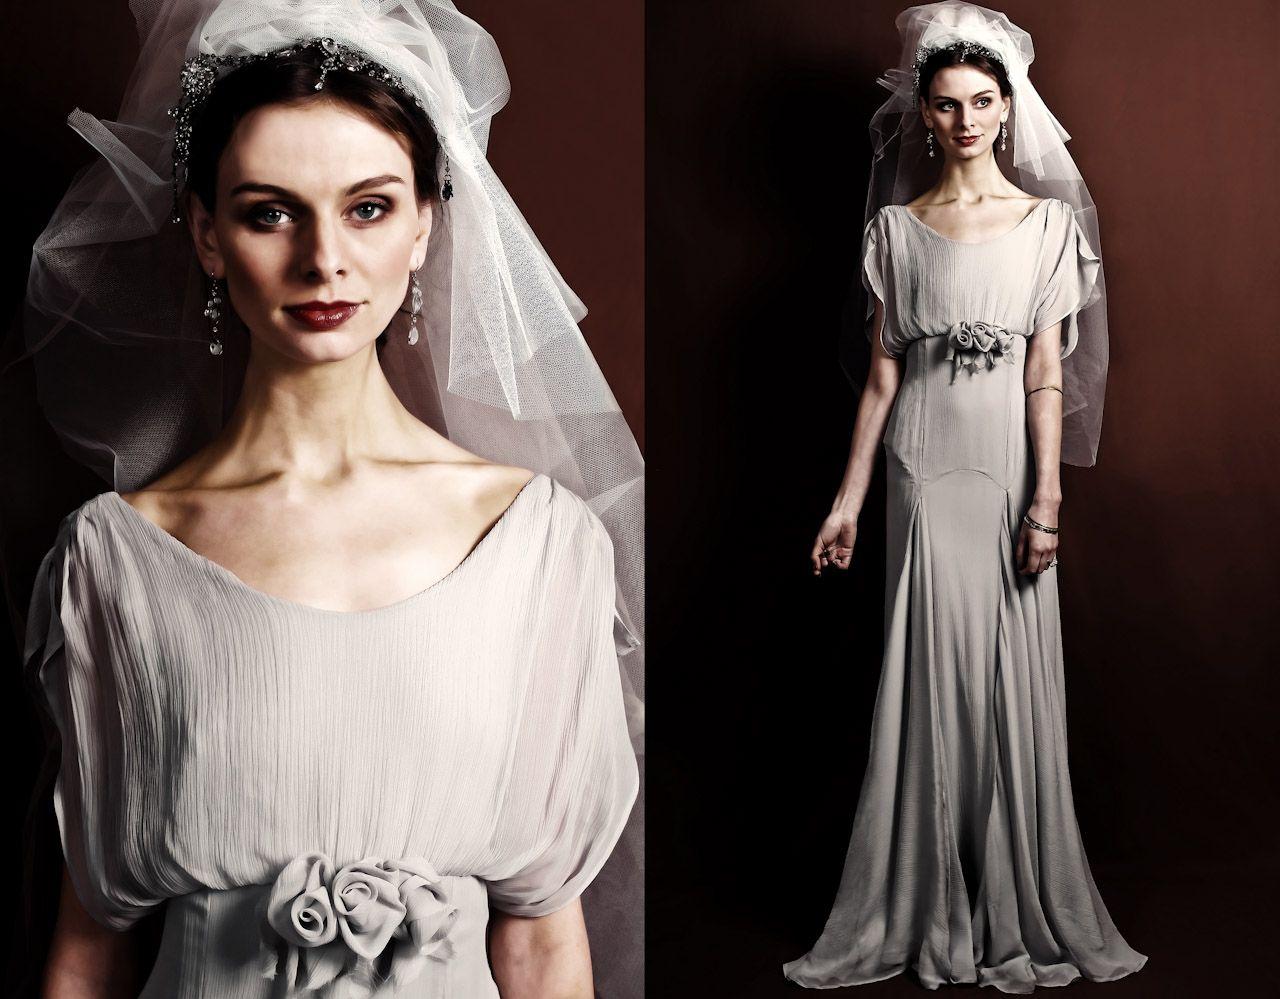 retro wedding dresses Vintage Inspired Wedding Dresses for Classic Wedding Wedding Sunny